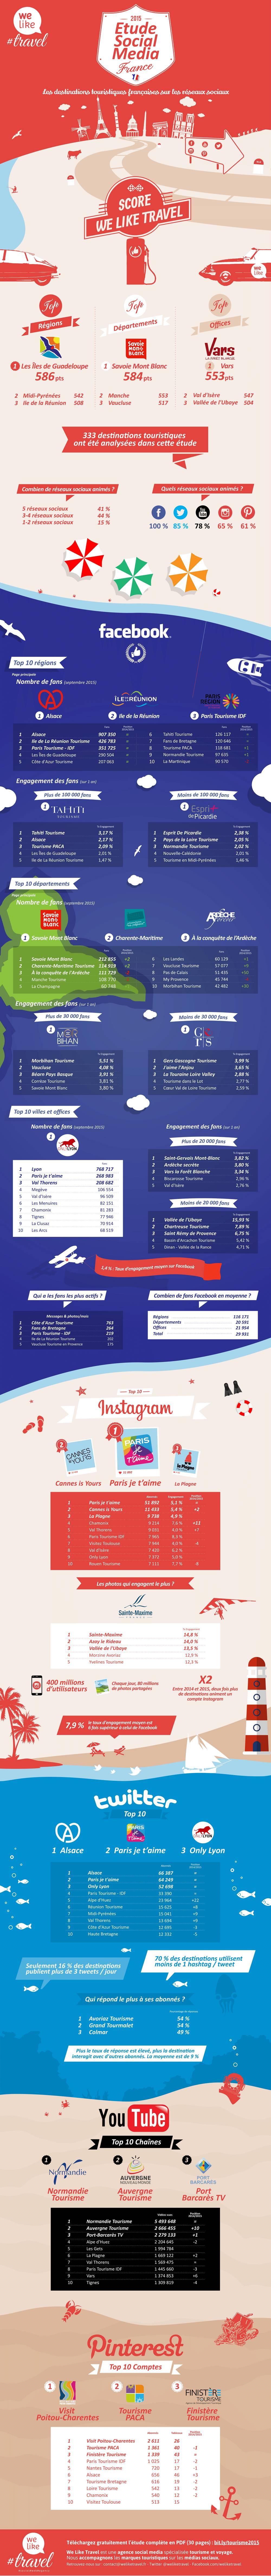 infographie-etude-social-media-tourisme-france-2015